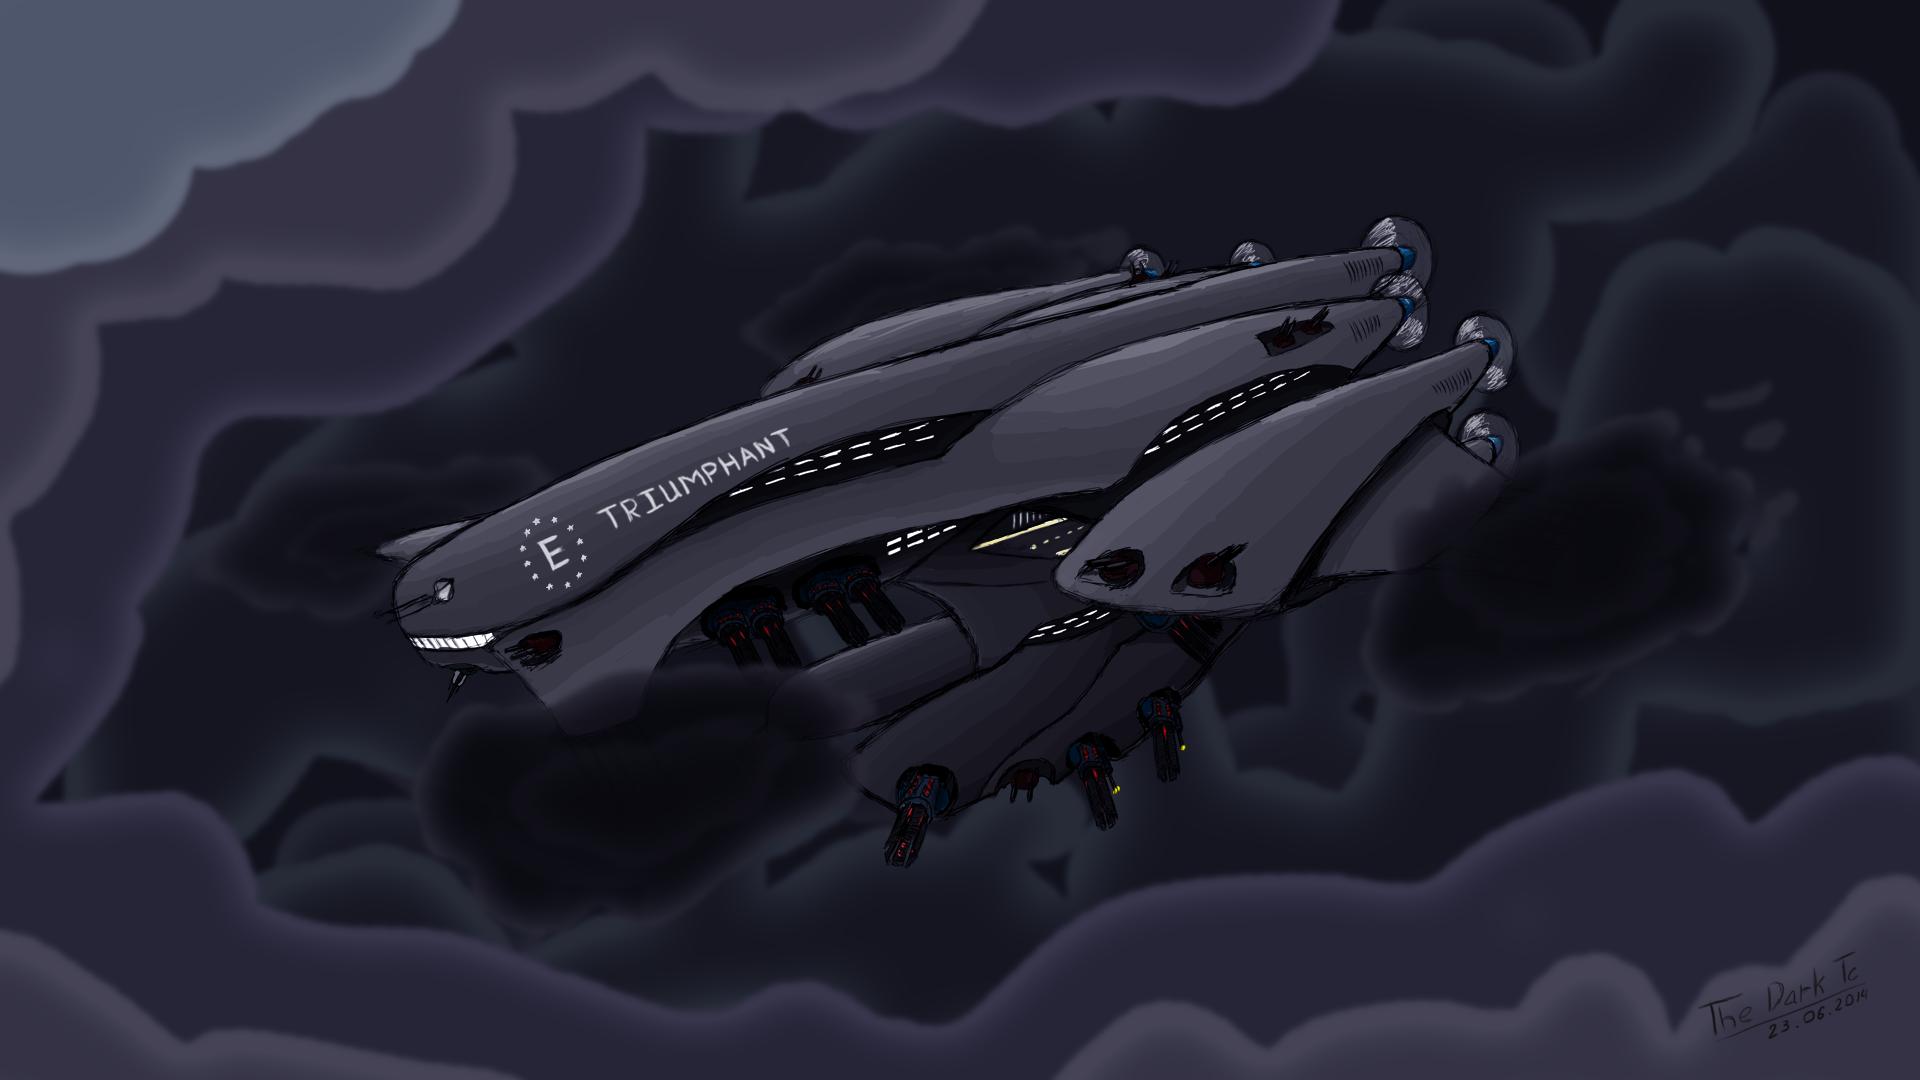 Thunderhead by The-Dark-Tc